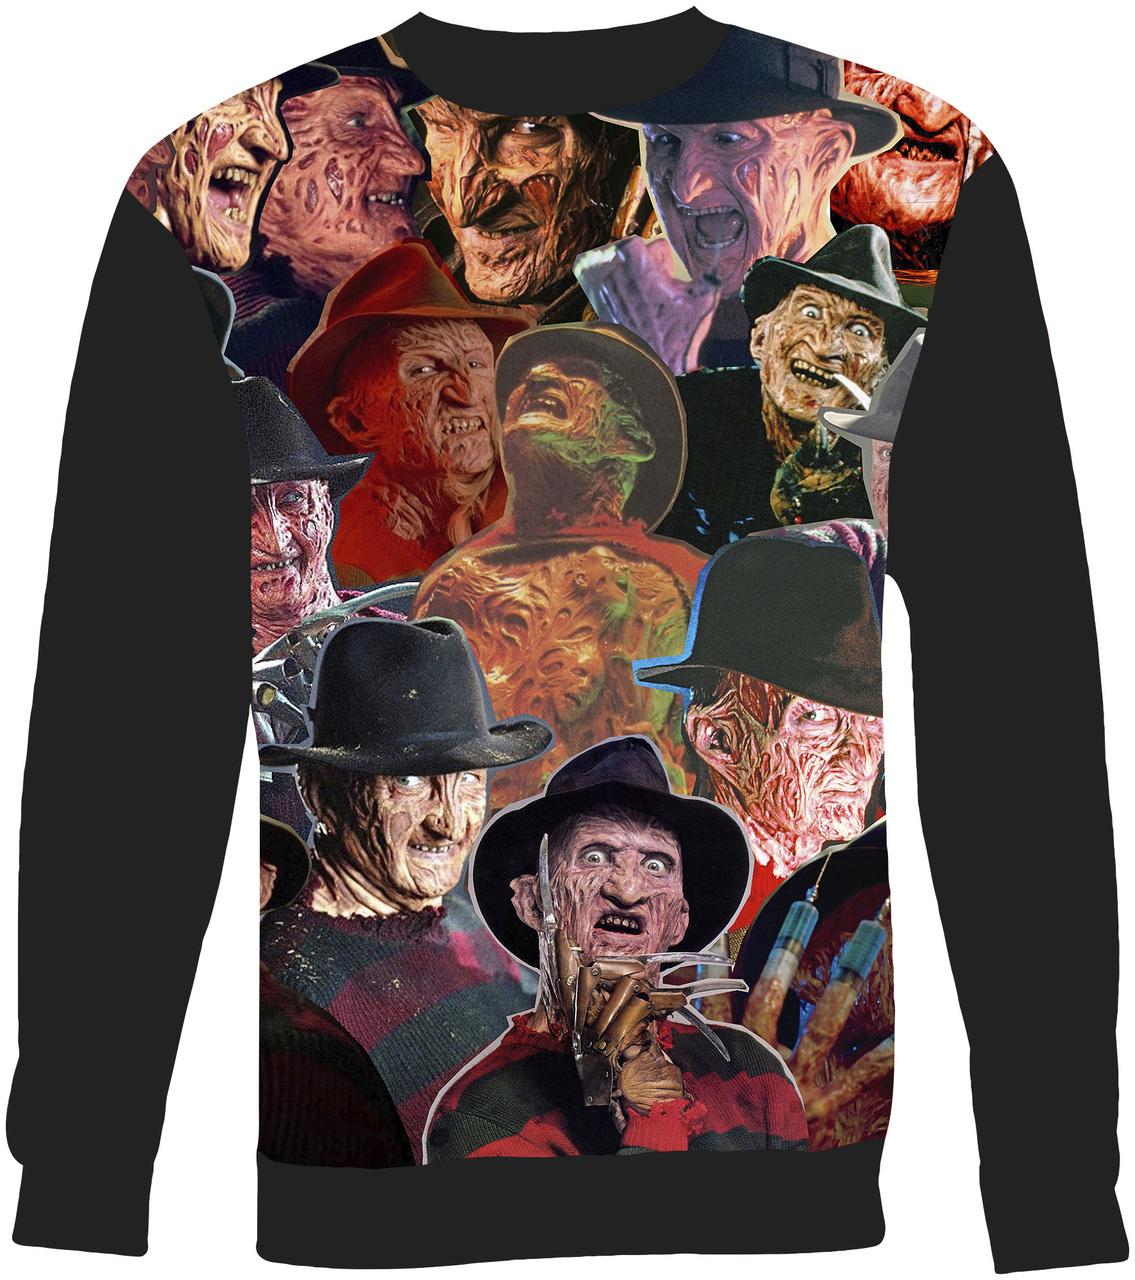 Freddy Krueger Collage Sweater Sweatshirt Subliworks